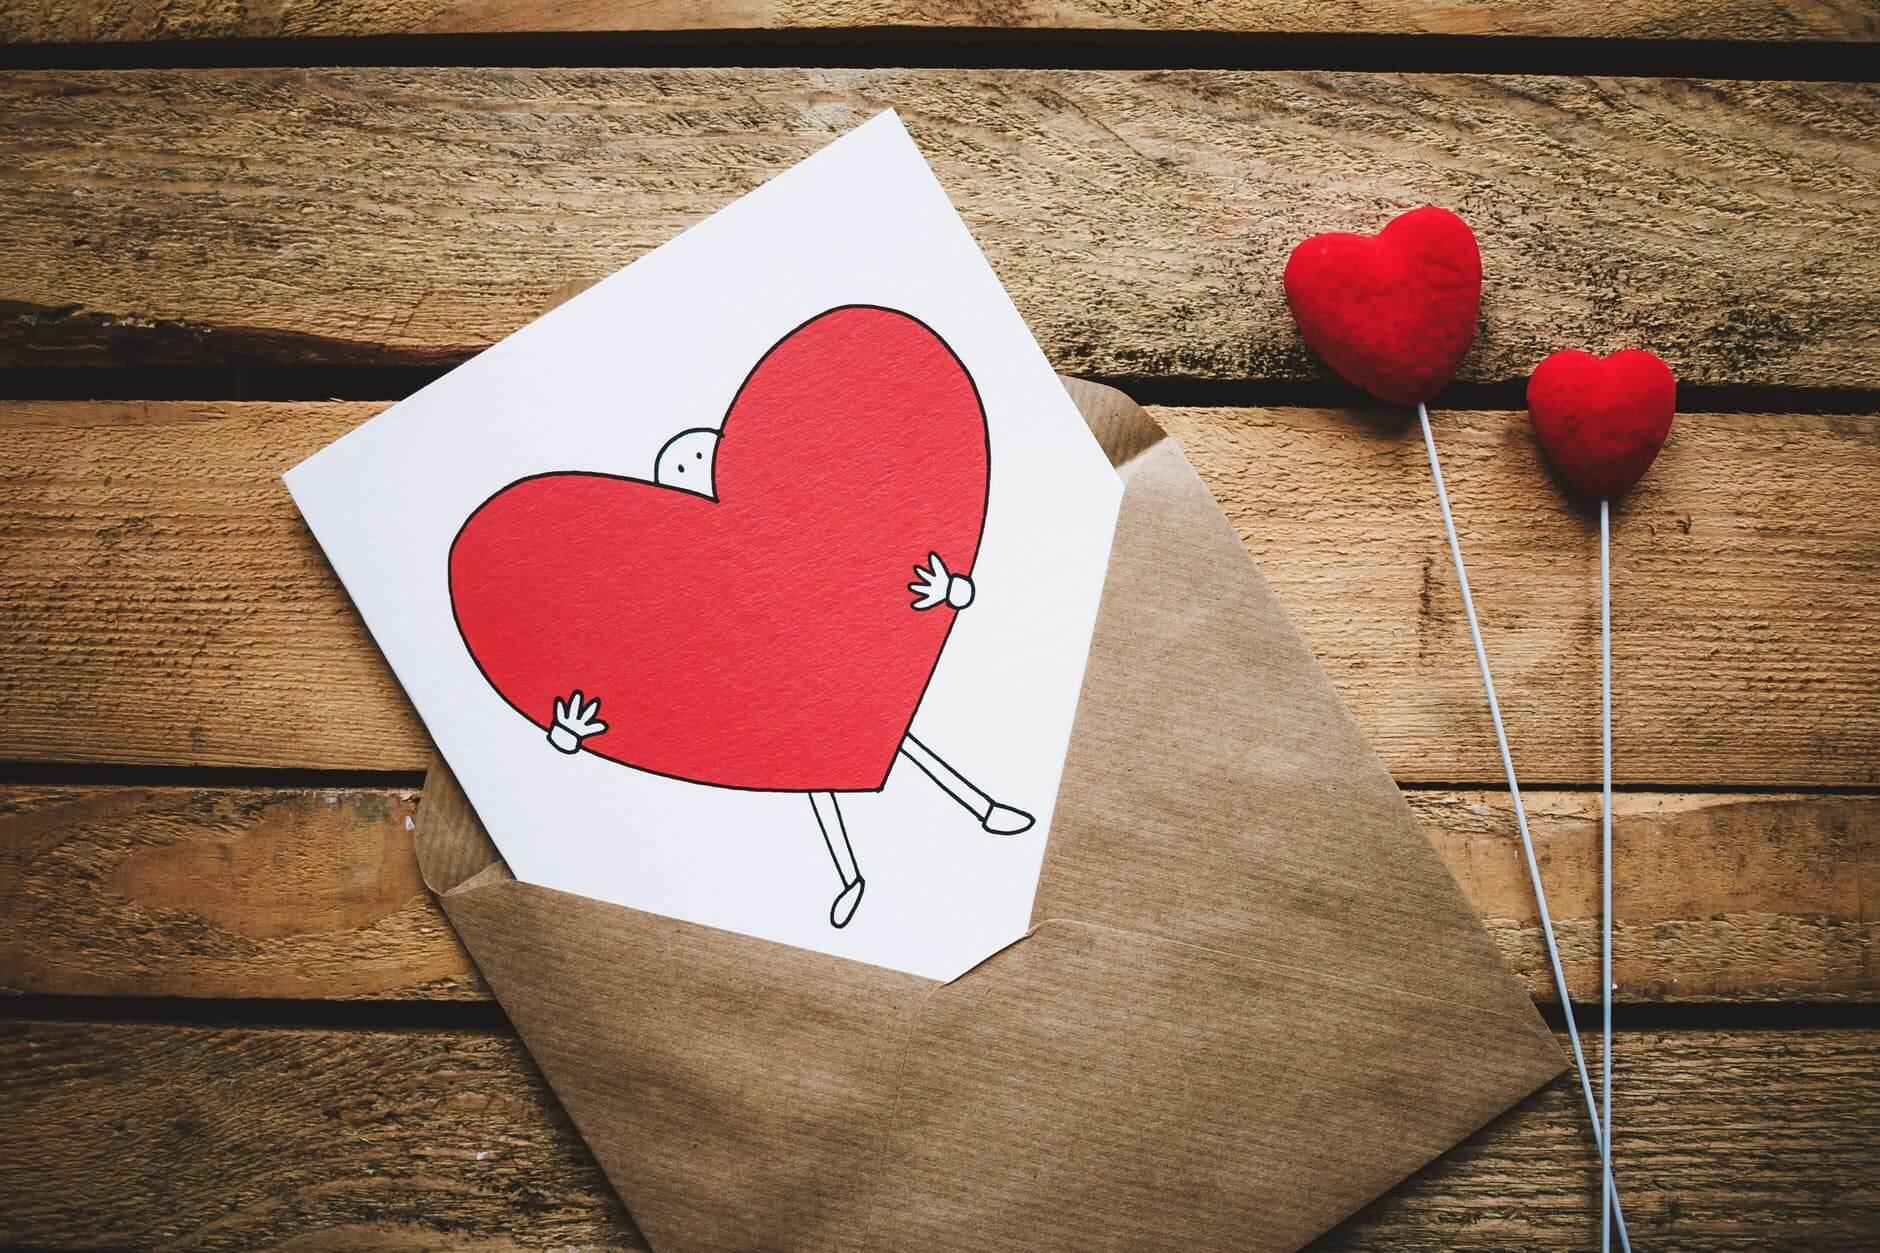 creative gift ideas for husband